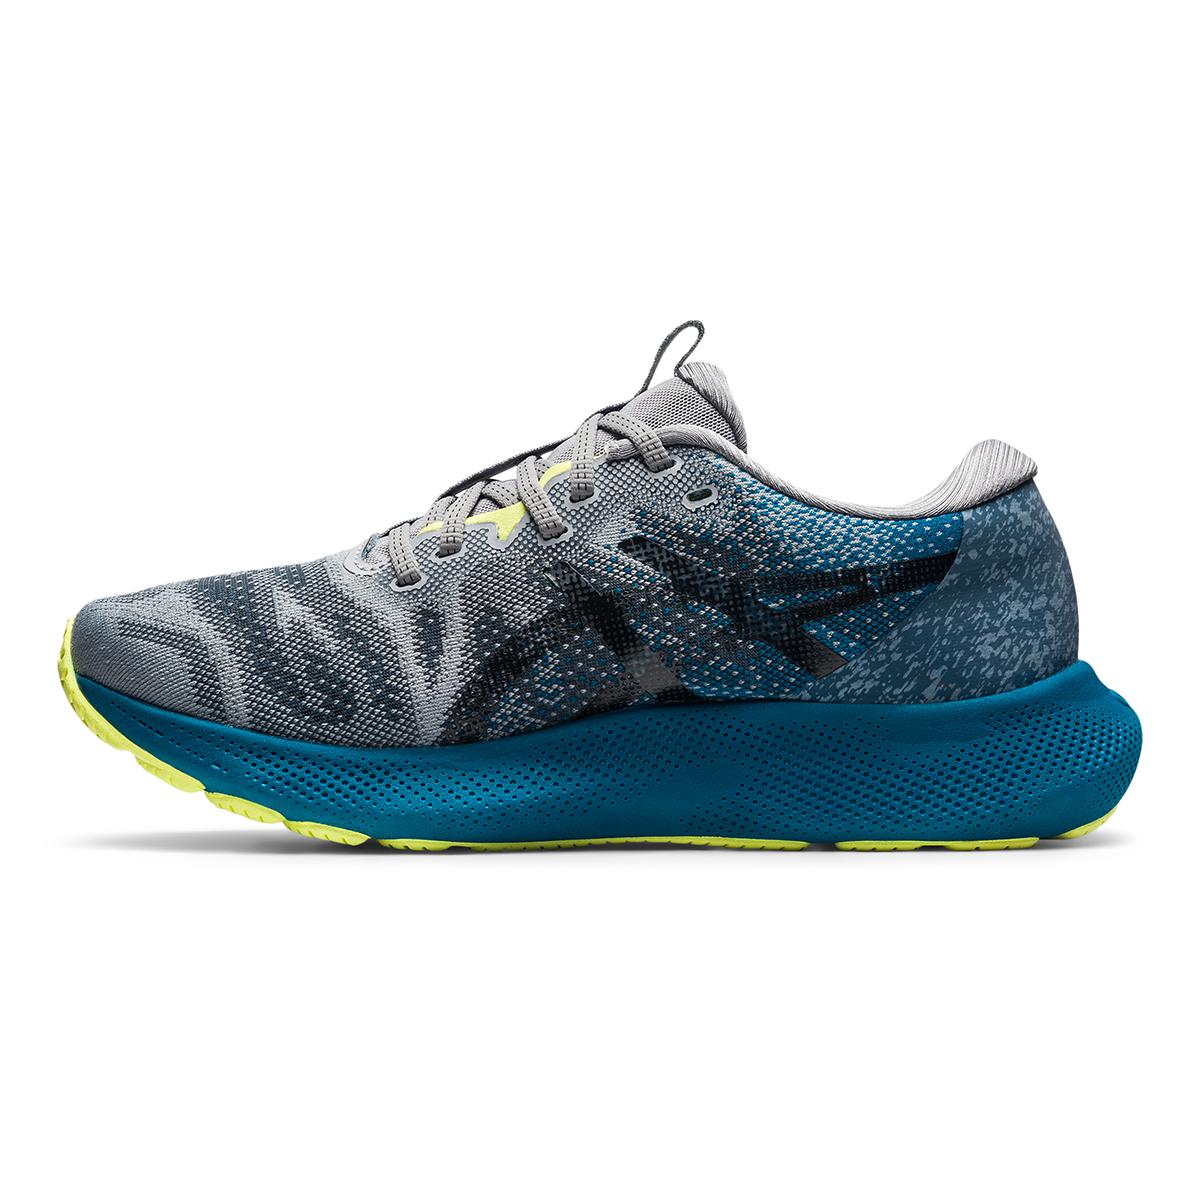 Men's Asics Gel-Nimbus Lite 2 Running Shoe - Color: Deep Sea Teal - Size: 7 - Width: Regular, Deep Sea Teal, large, image 2